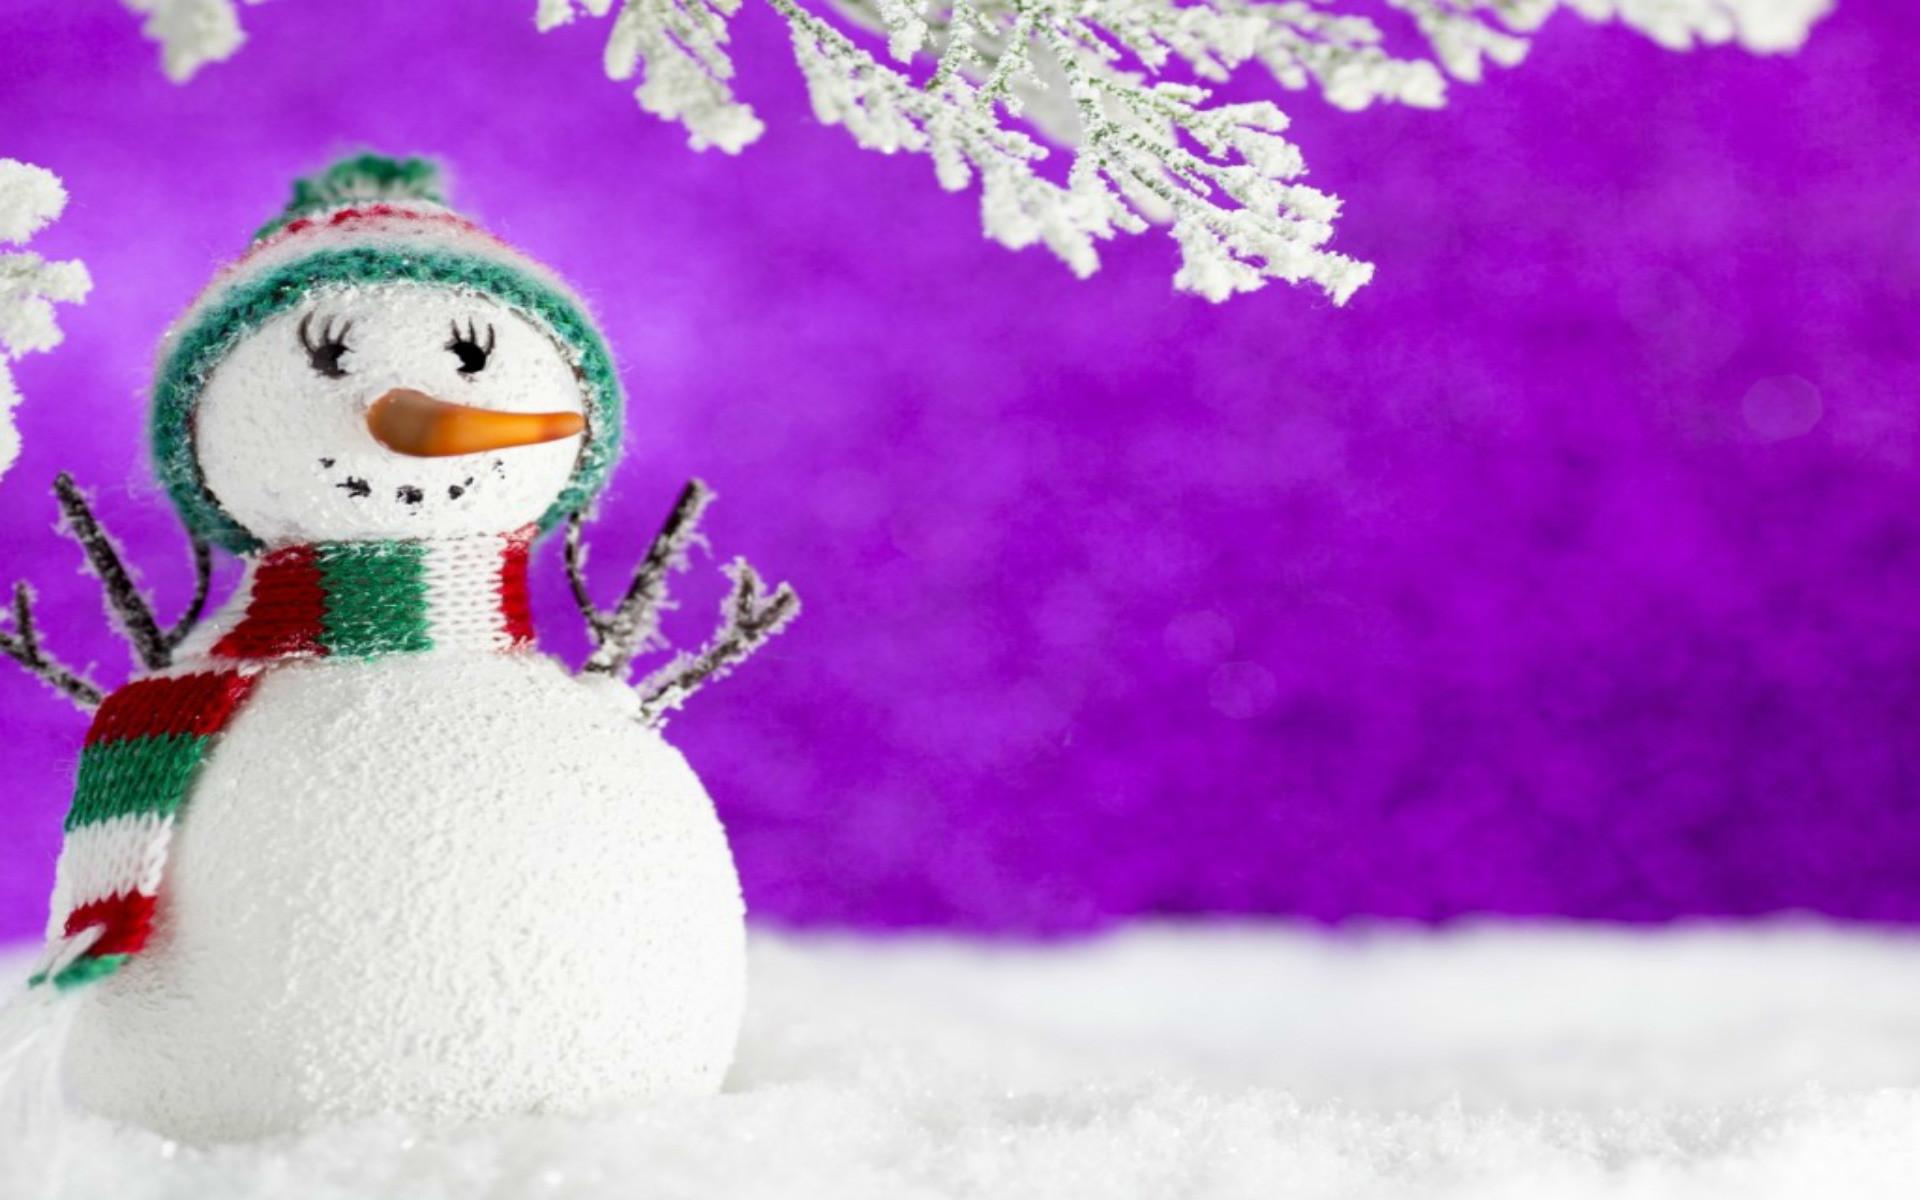 Cute Snowman Christmas Wallpaper Christmas Penguin Wallpaper 68 Images